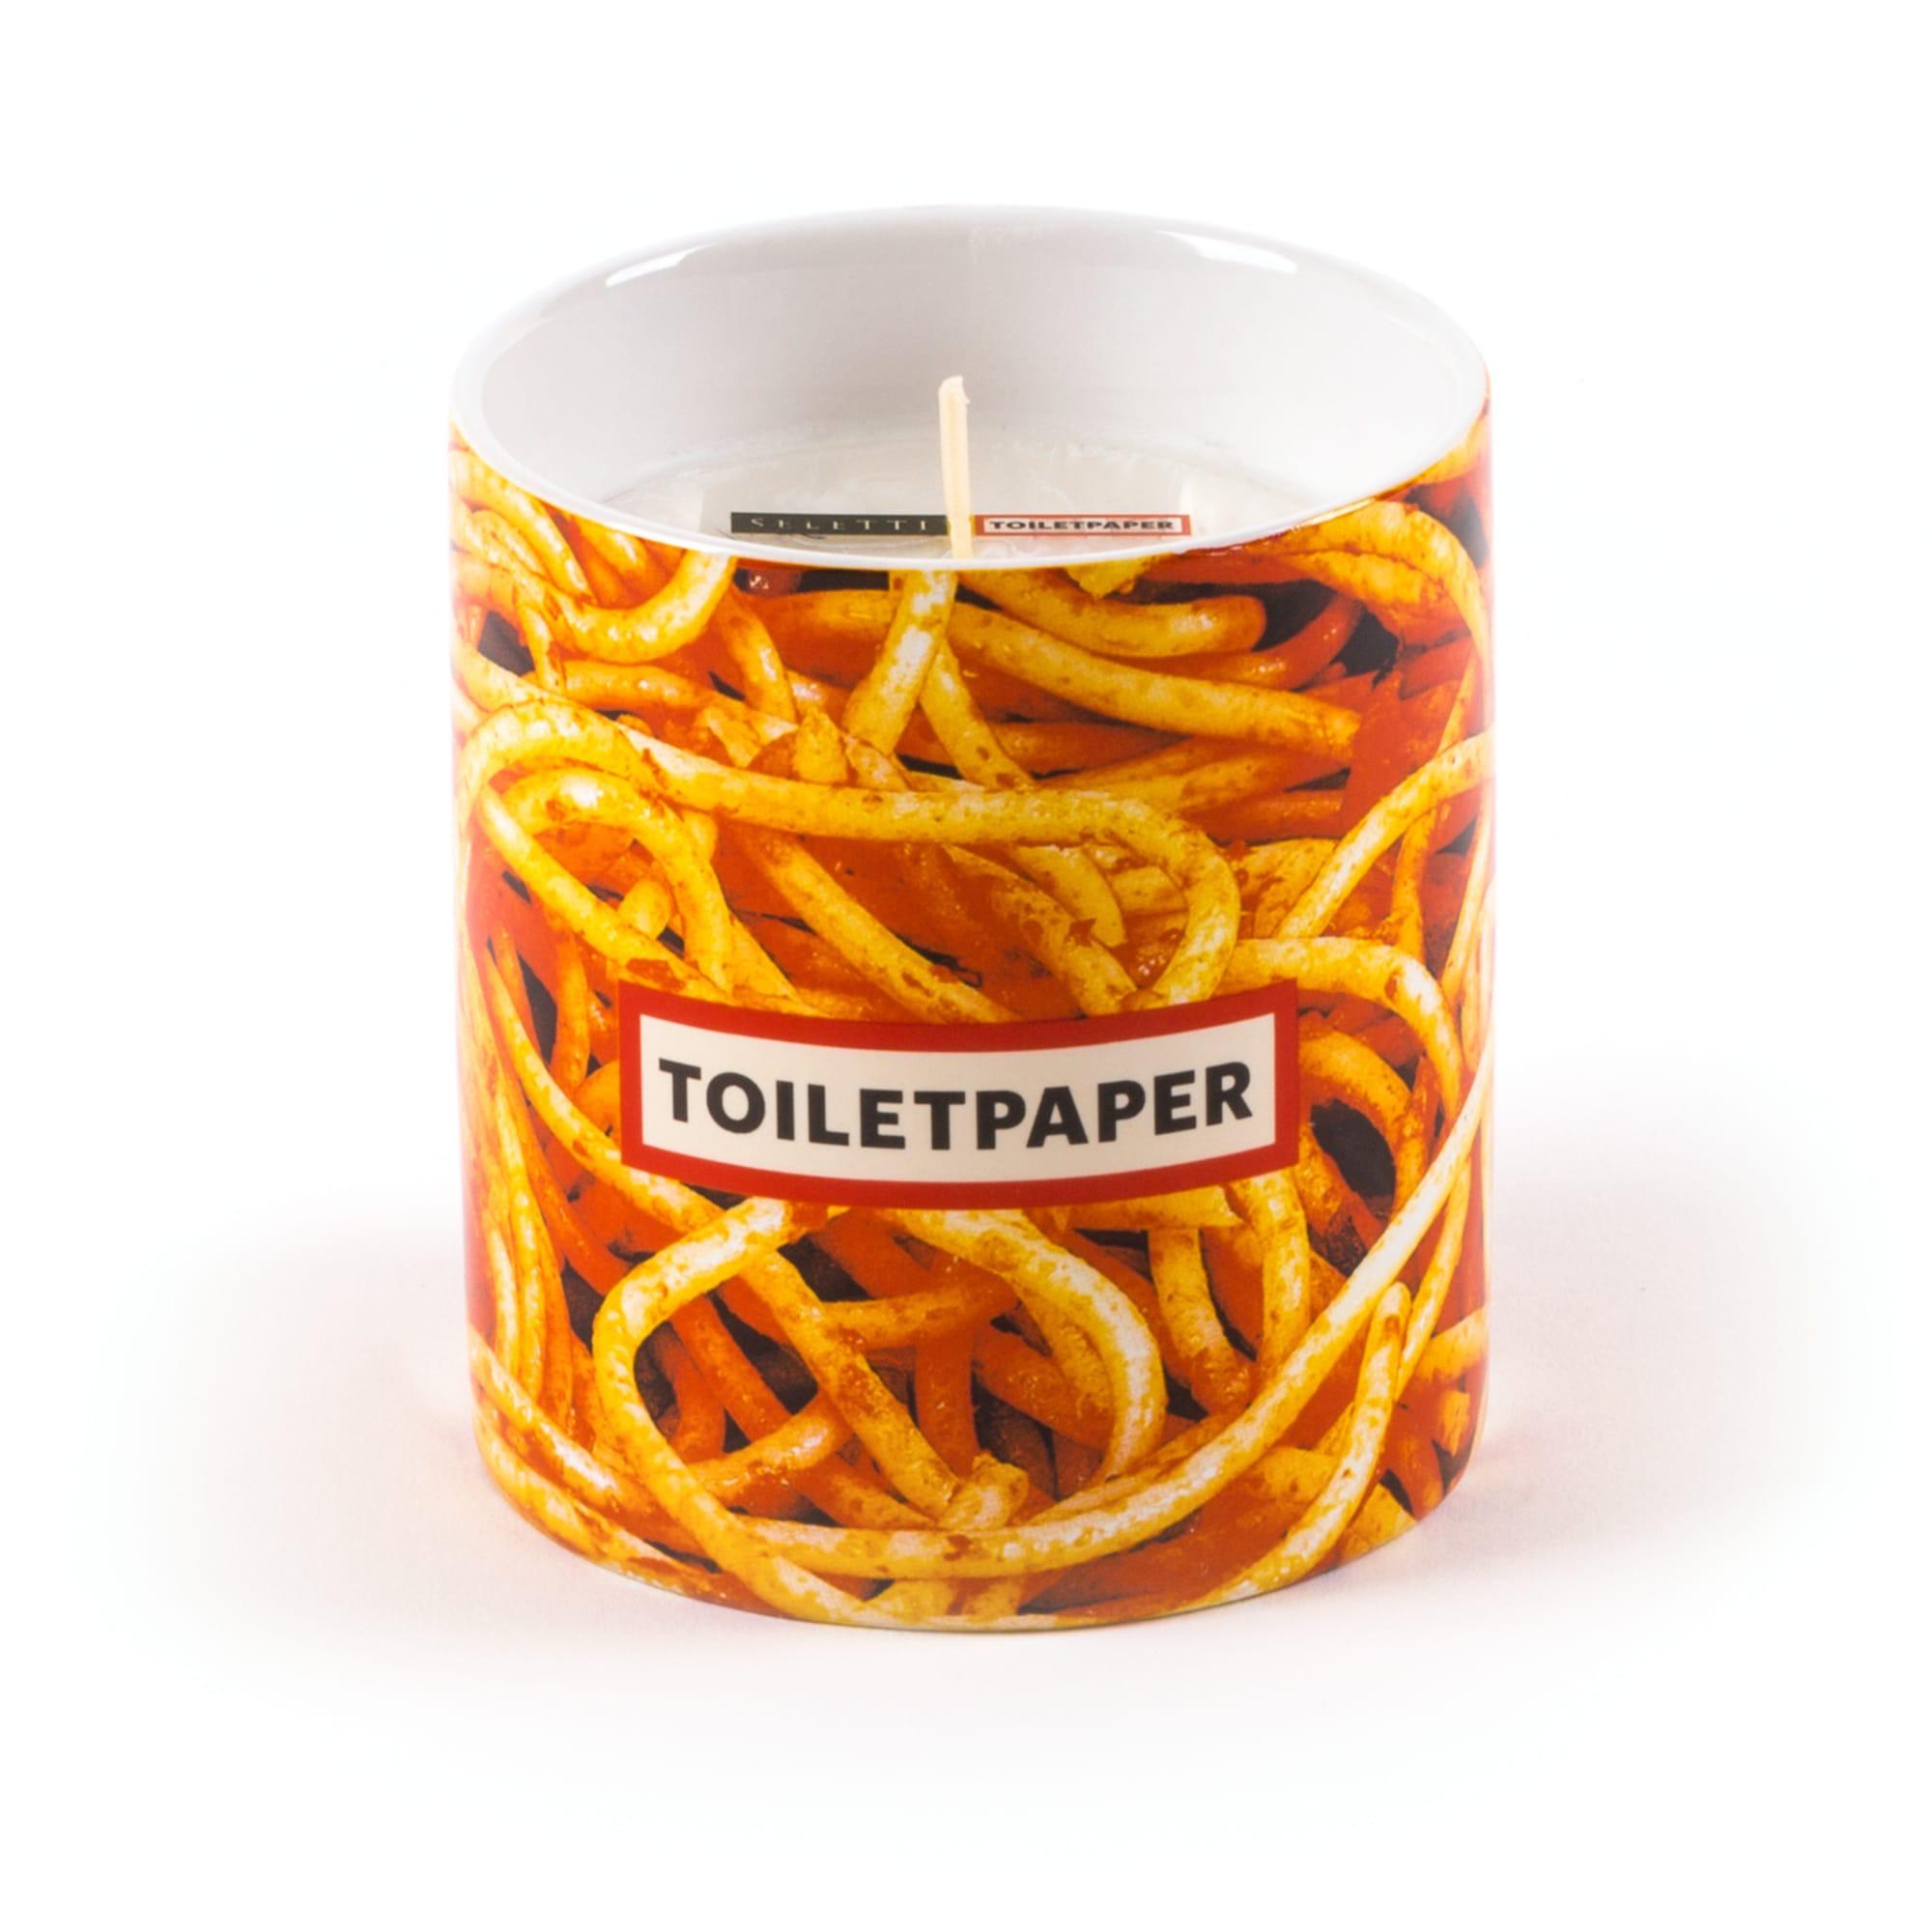 Toiletpaper Candle Spaghetti